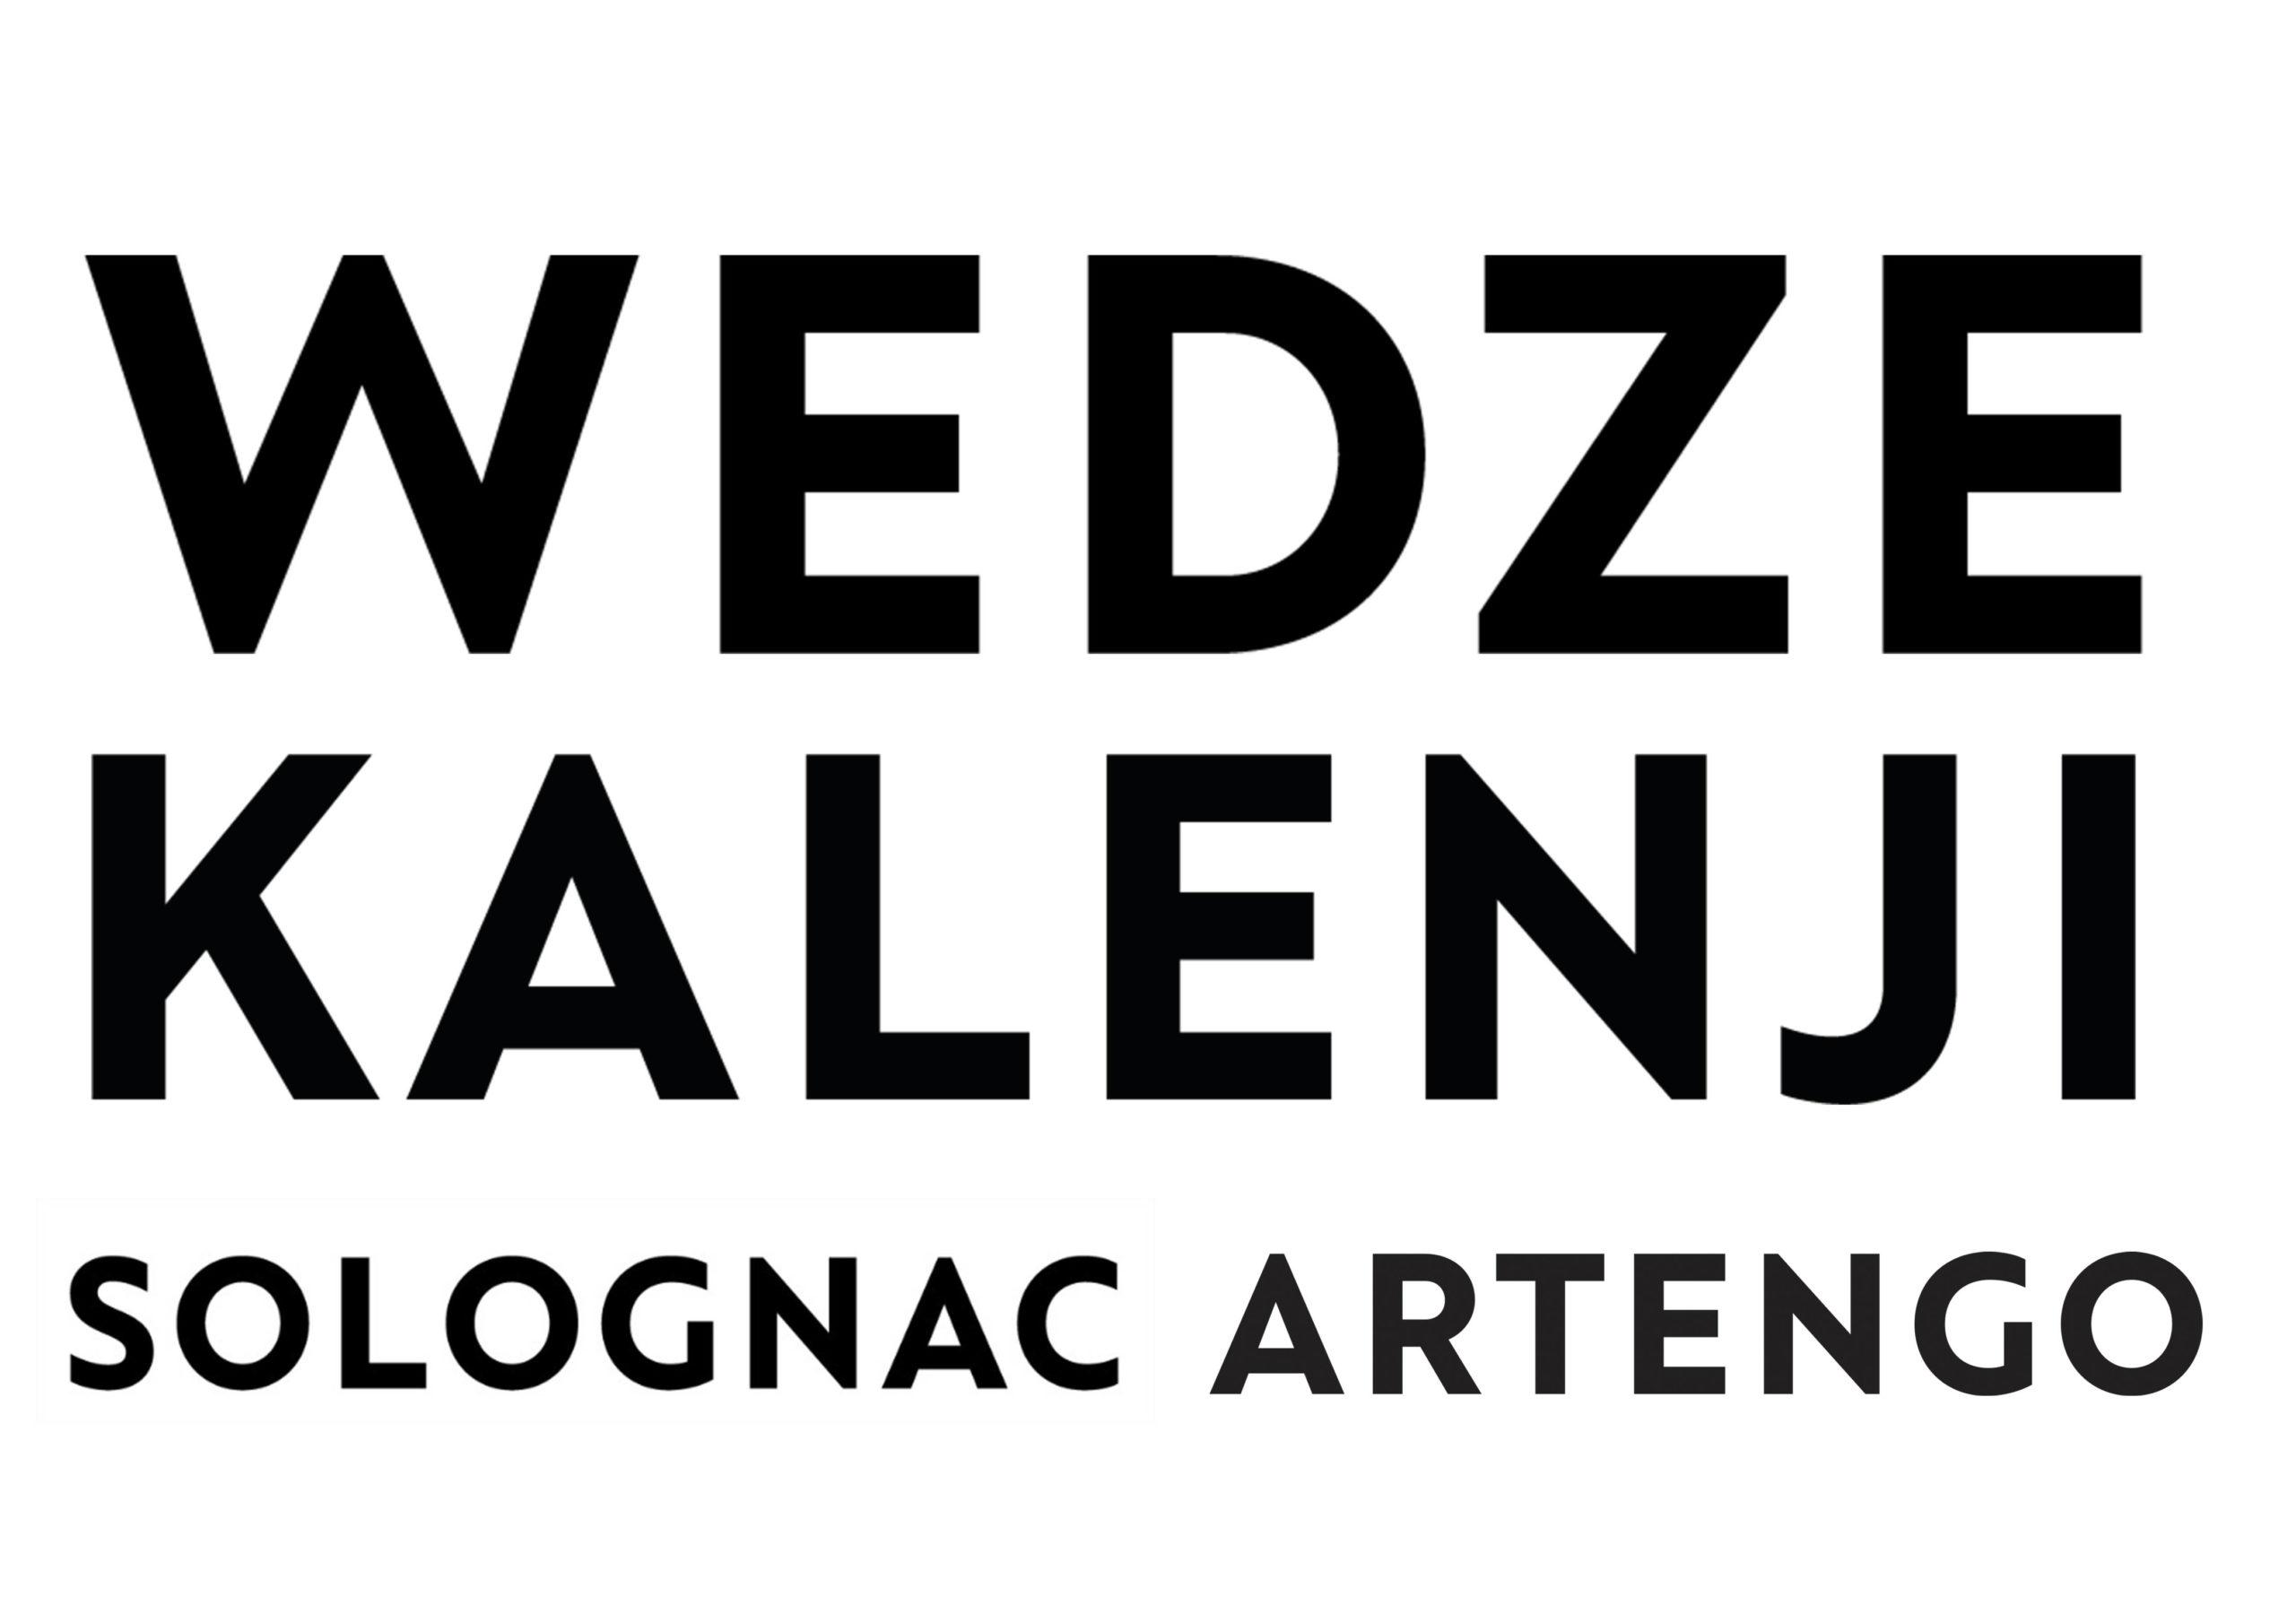 Création d'Artengo, Wed'ze, Solognac, et Kalenji